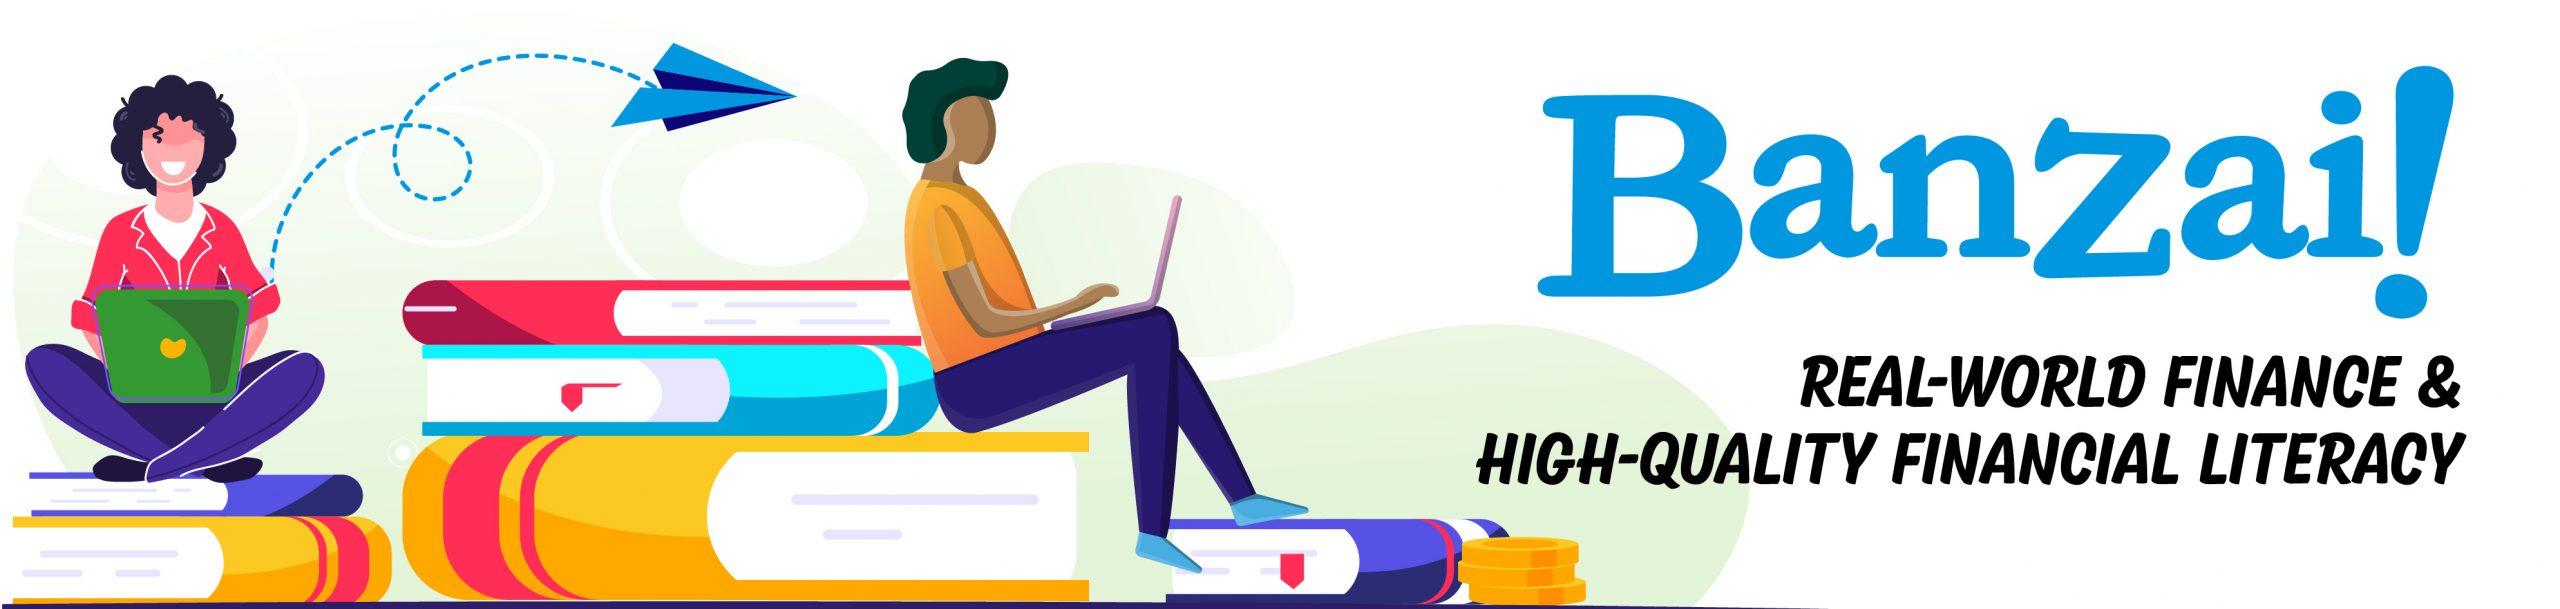 Banzai Real World Finance and High Quality Financial Literacy